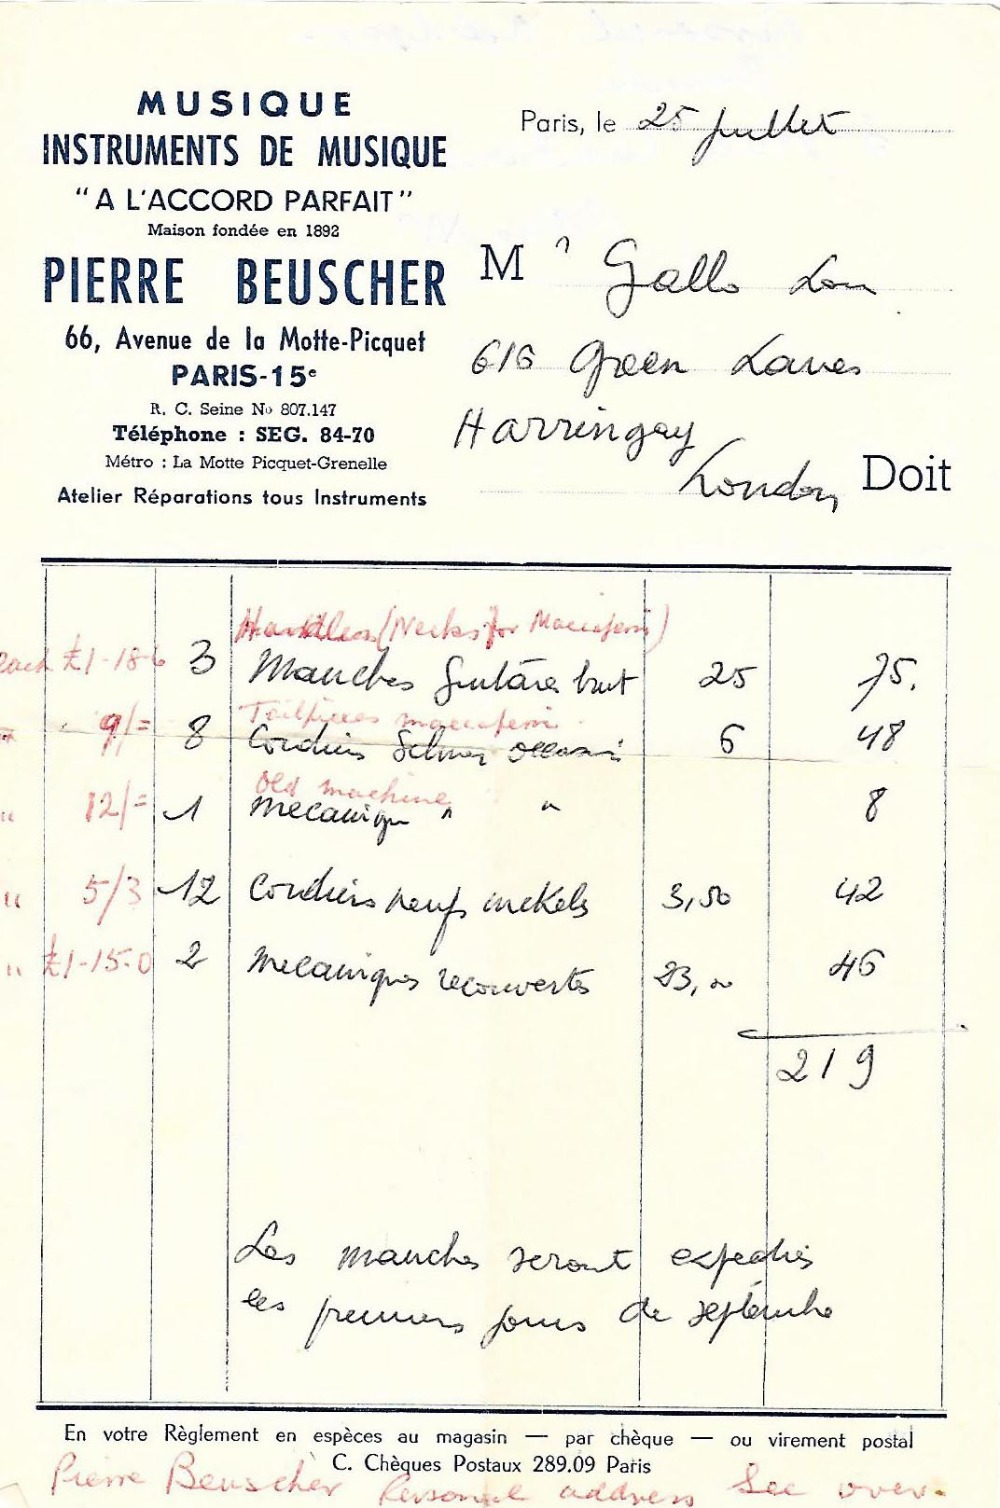 1933 Selmer Orchestra model Maccaferri oval sound hole guitar, no. 269 - Image 18 of 22